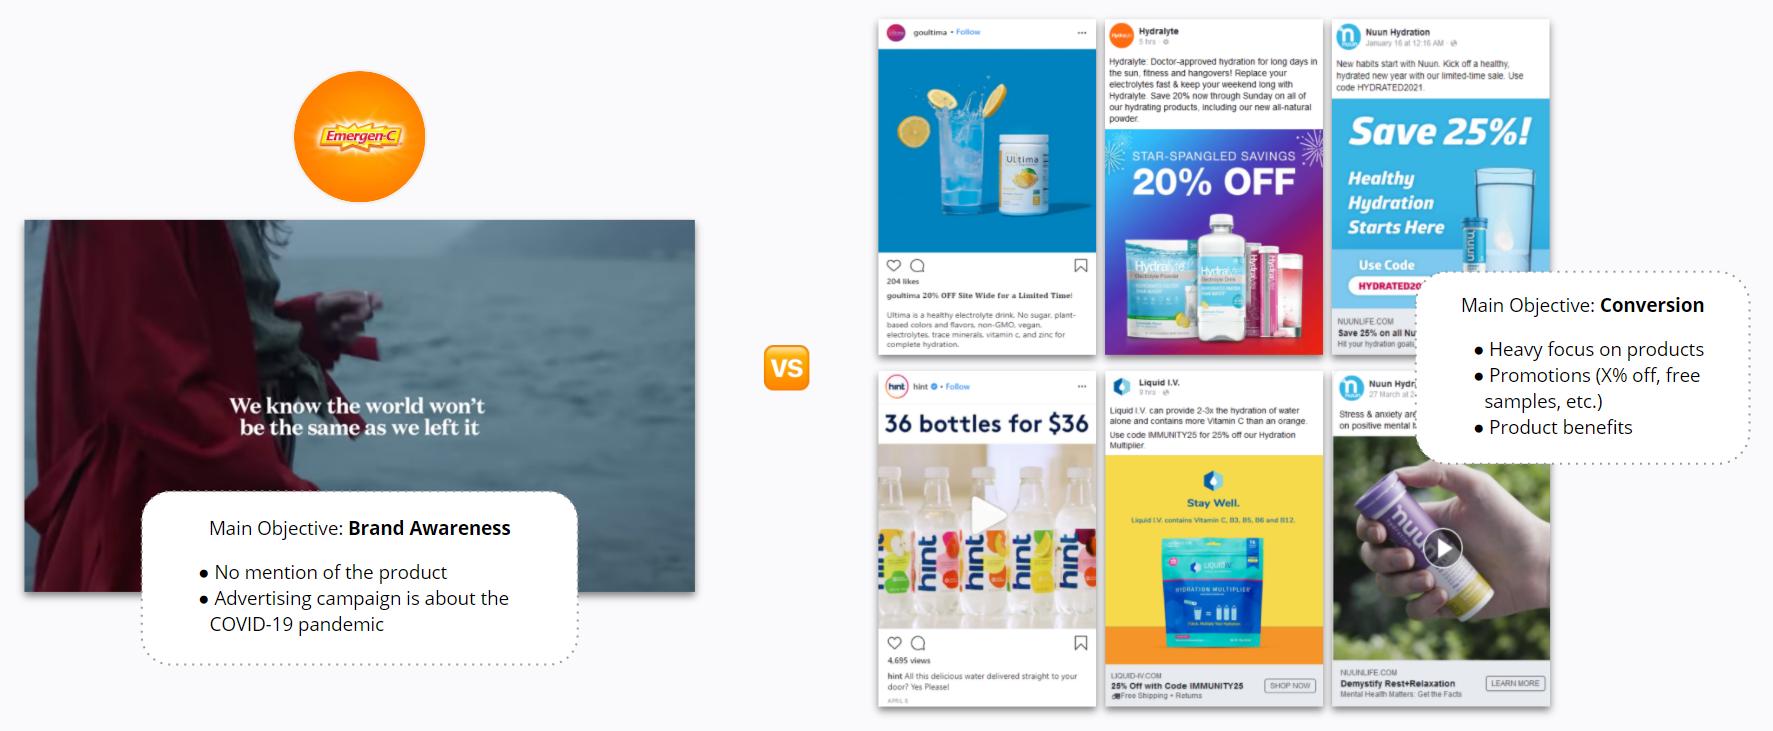 Emergen-C - Brand Awareness Ads